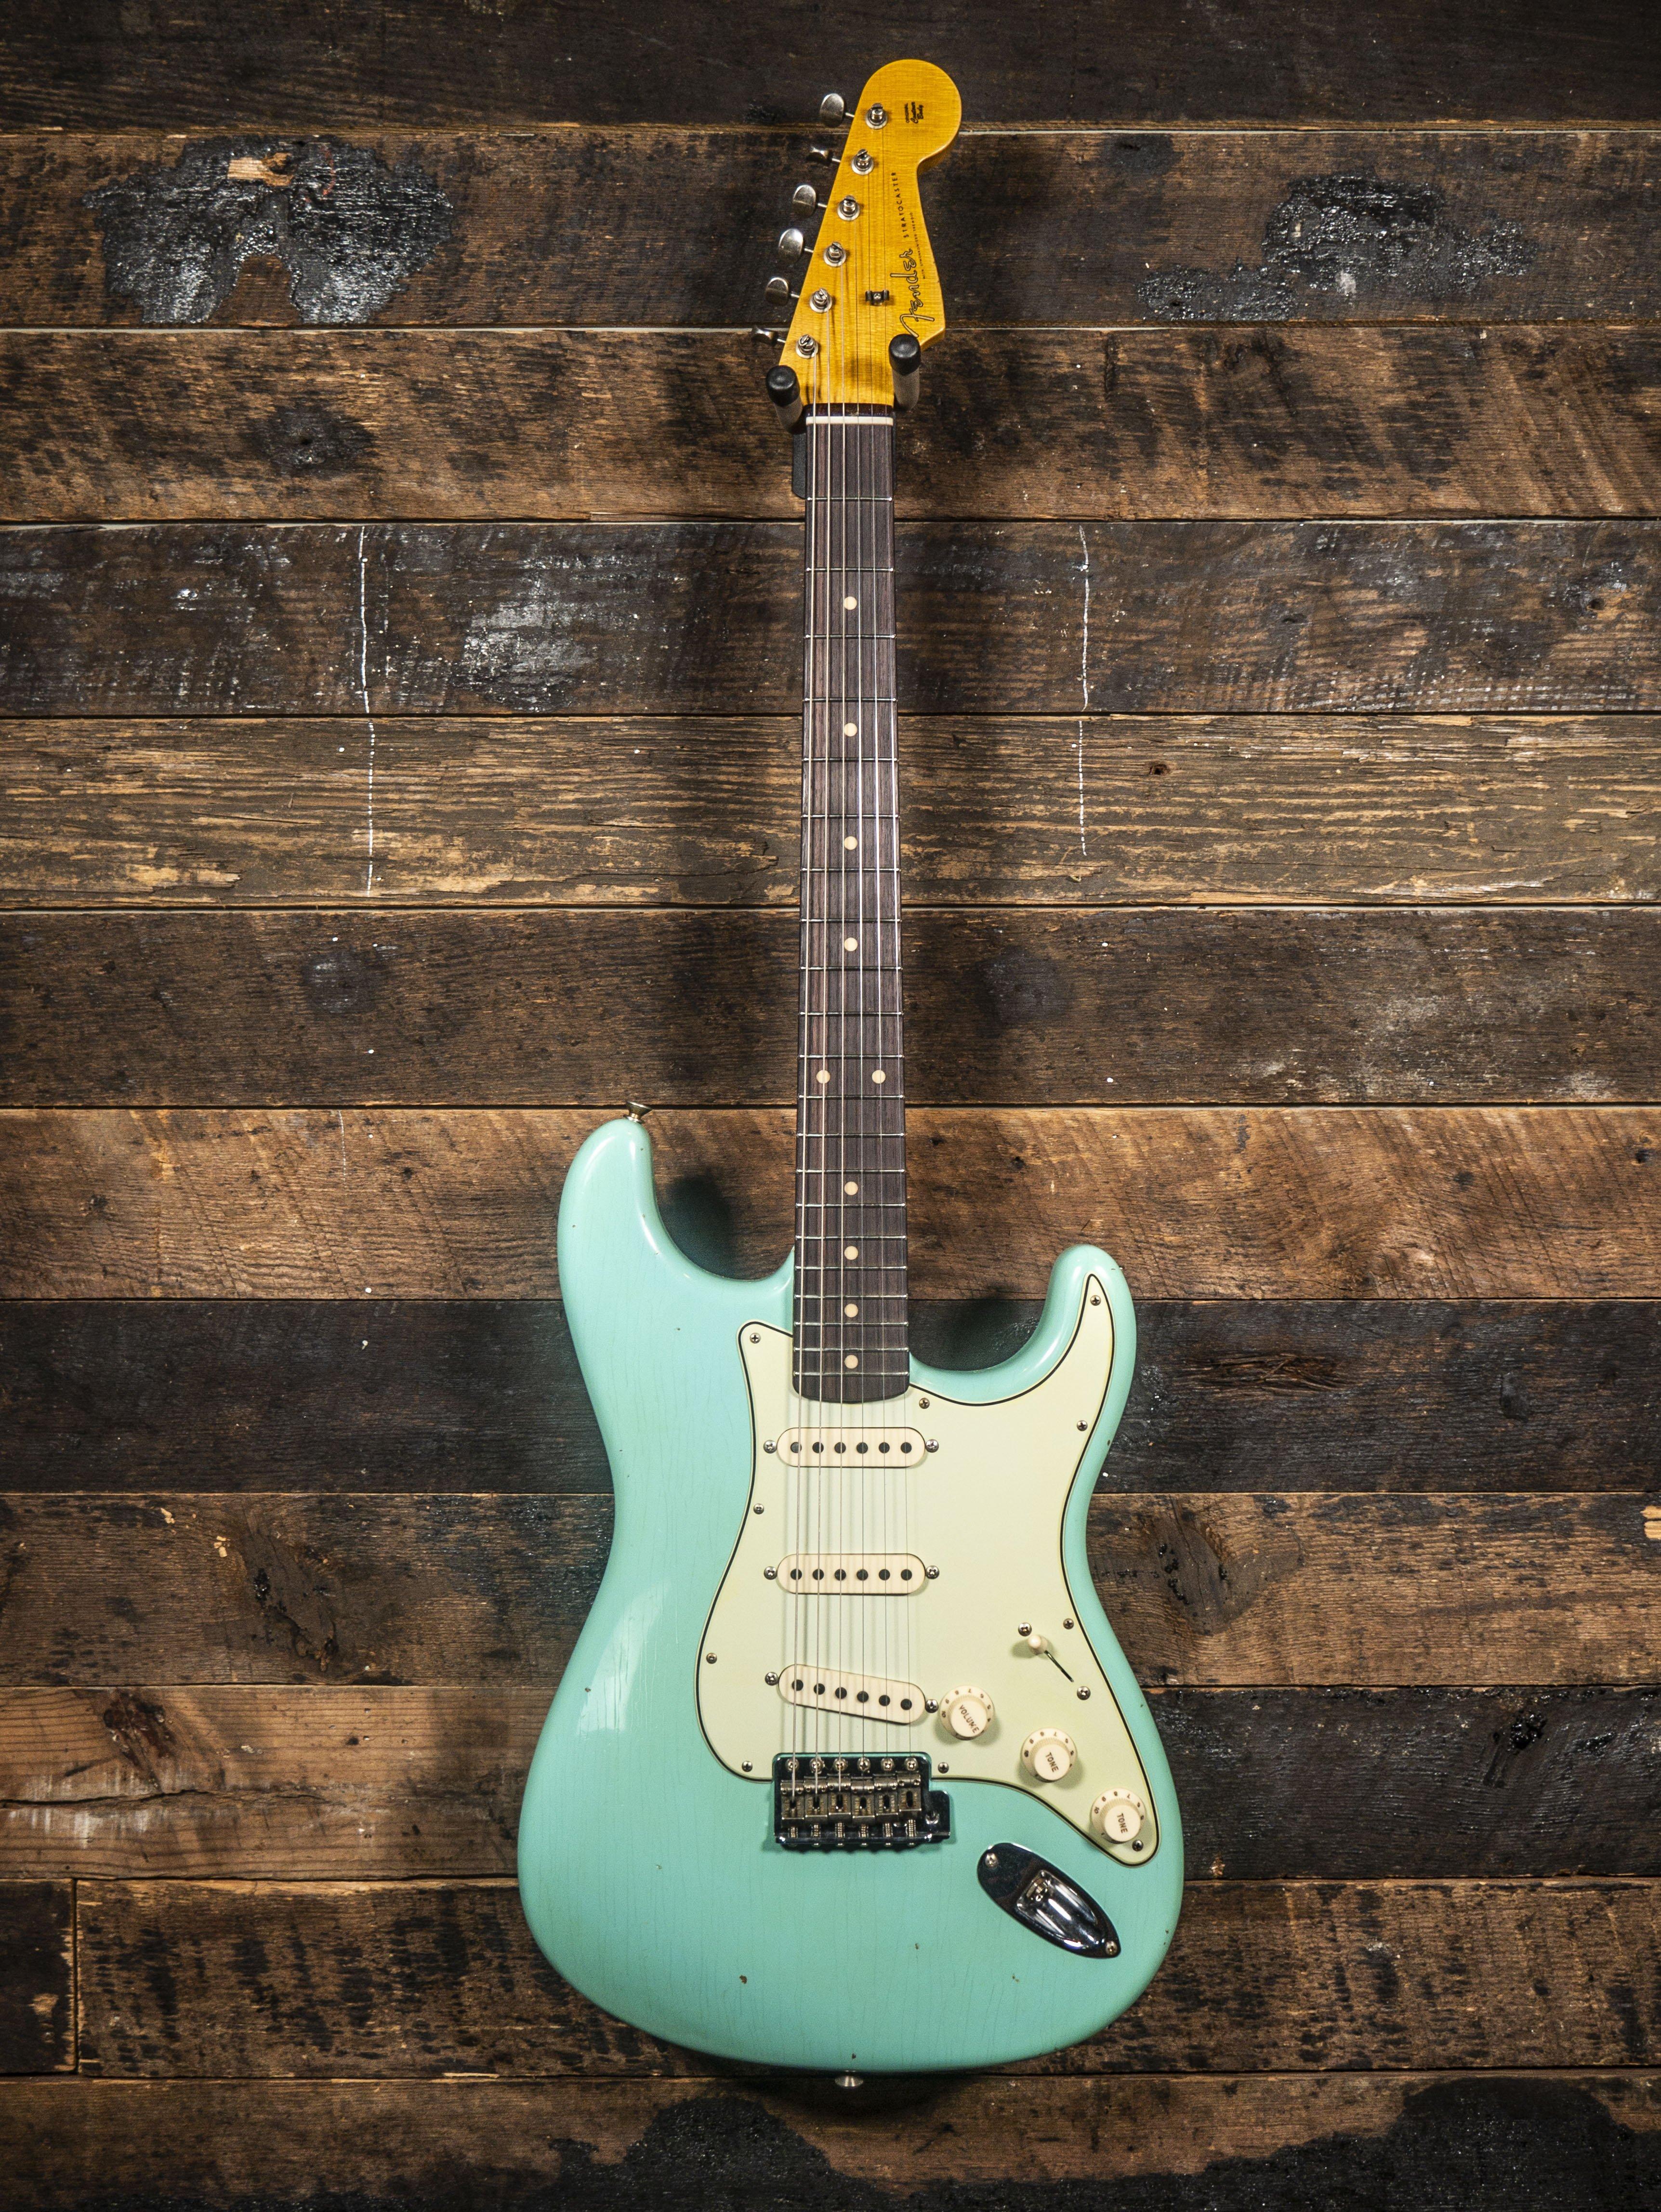 Fender Custom Shop Limited '59 Stratocaster Seafoam Green